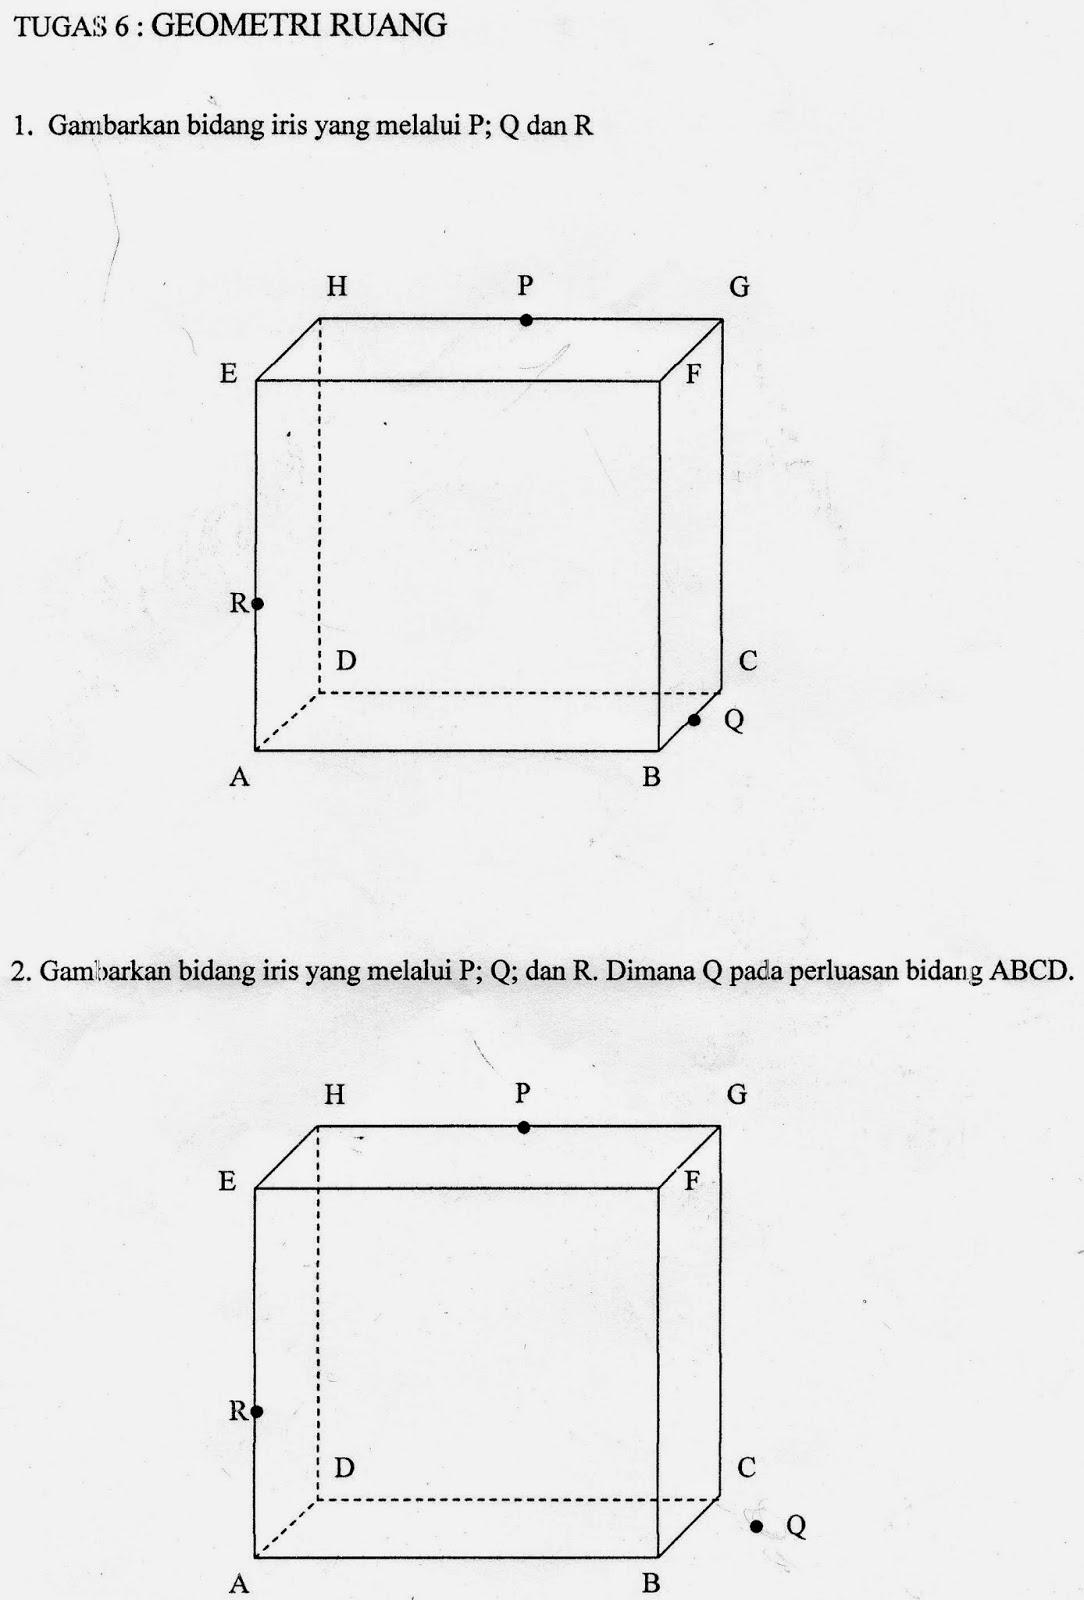 4 Soal Matematika Latihan Soal Bidang Iris